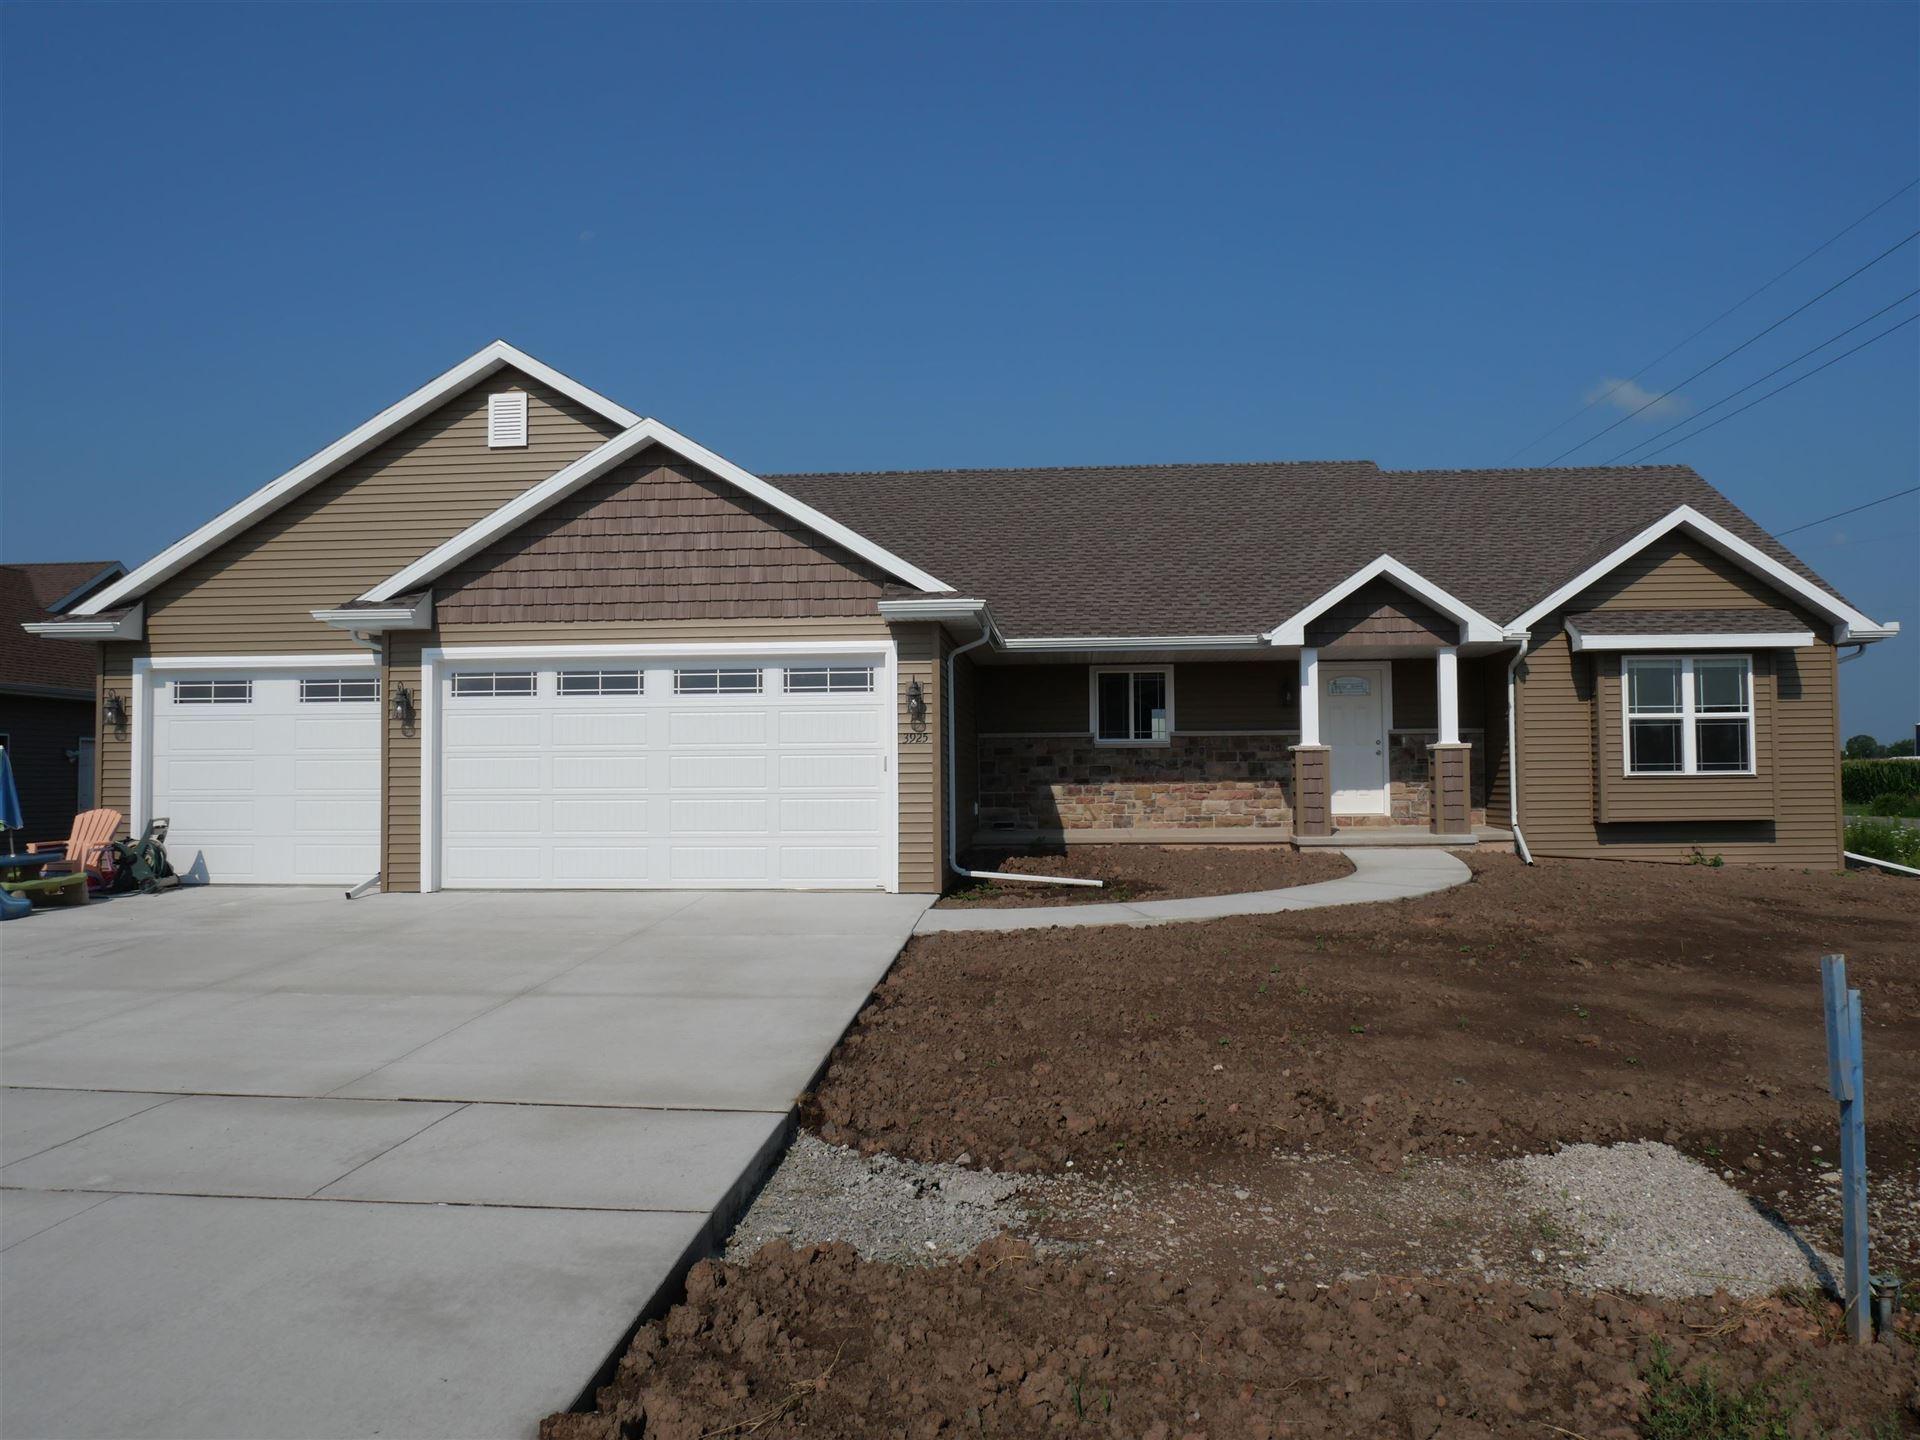 3337 E RUBY RED Drive, Appleton, WI 54913 - MLS#: 50247856